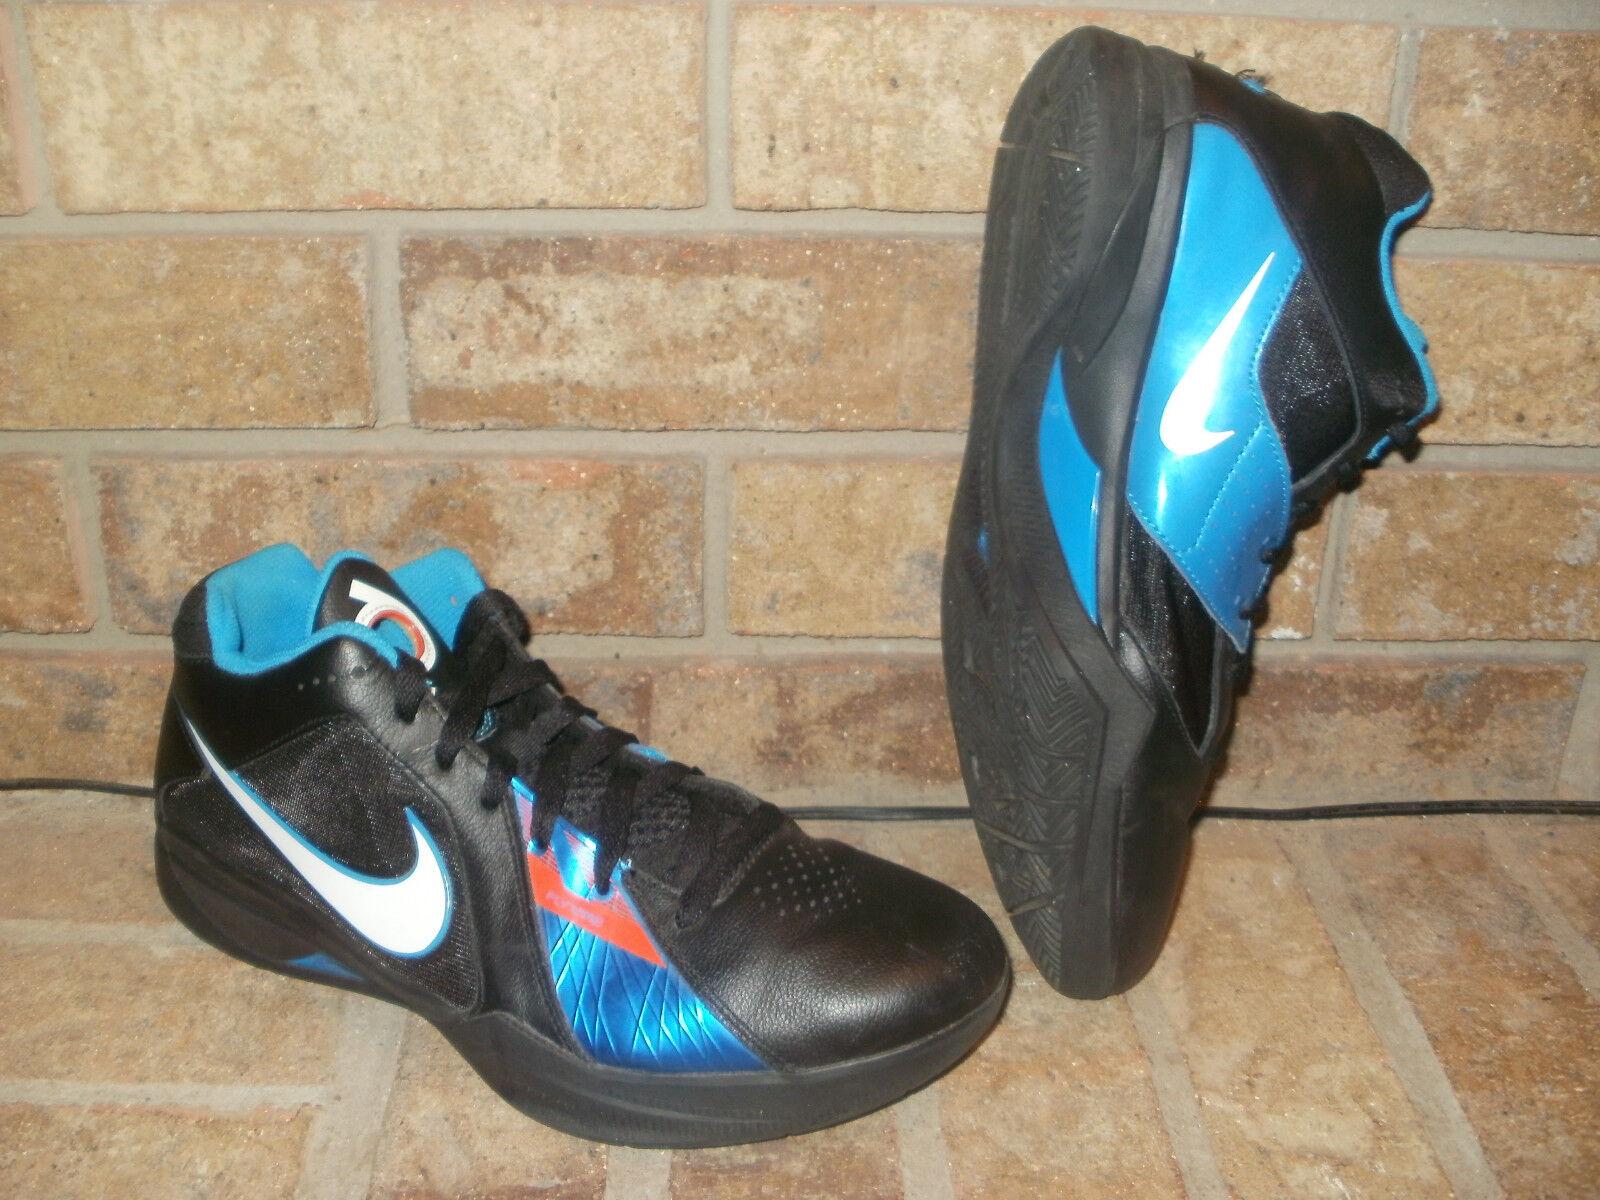 Nike Zoom KD 3/K Durant 10.5 /Black-White-Blue-Orange (OKC Away) 417279-001 Rare